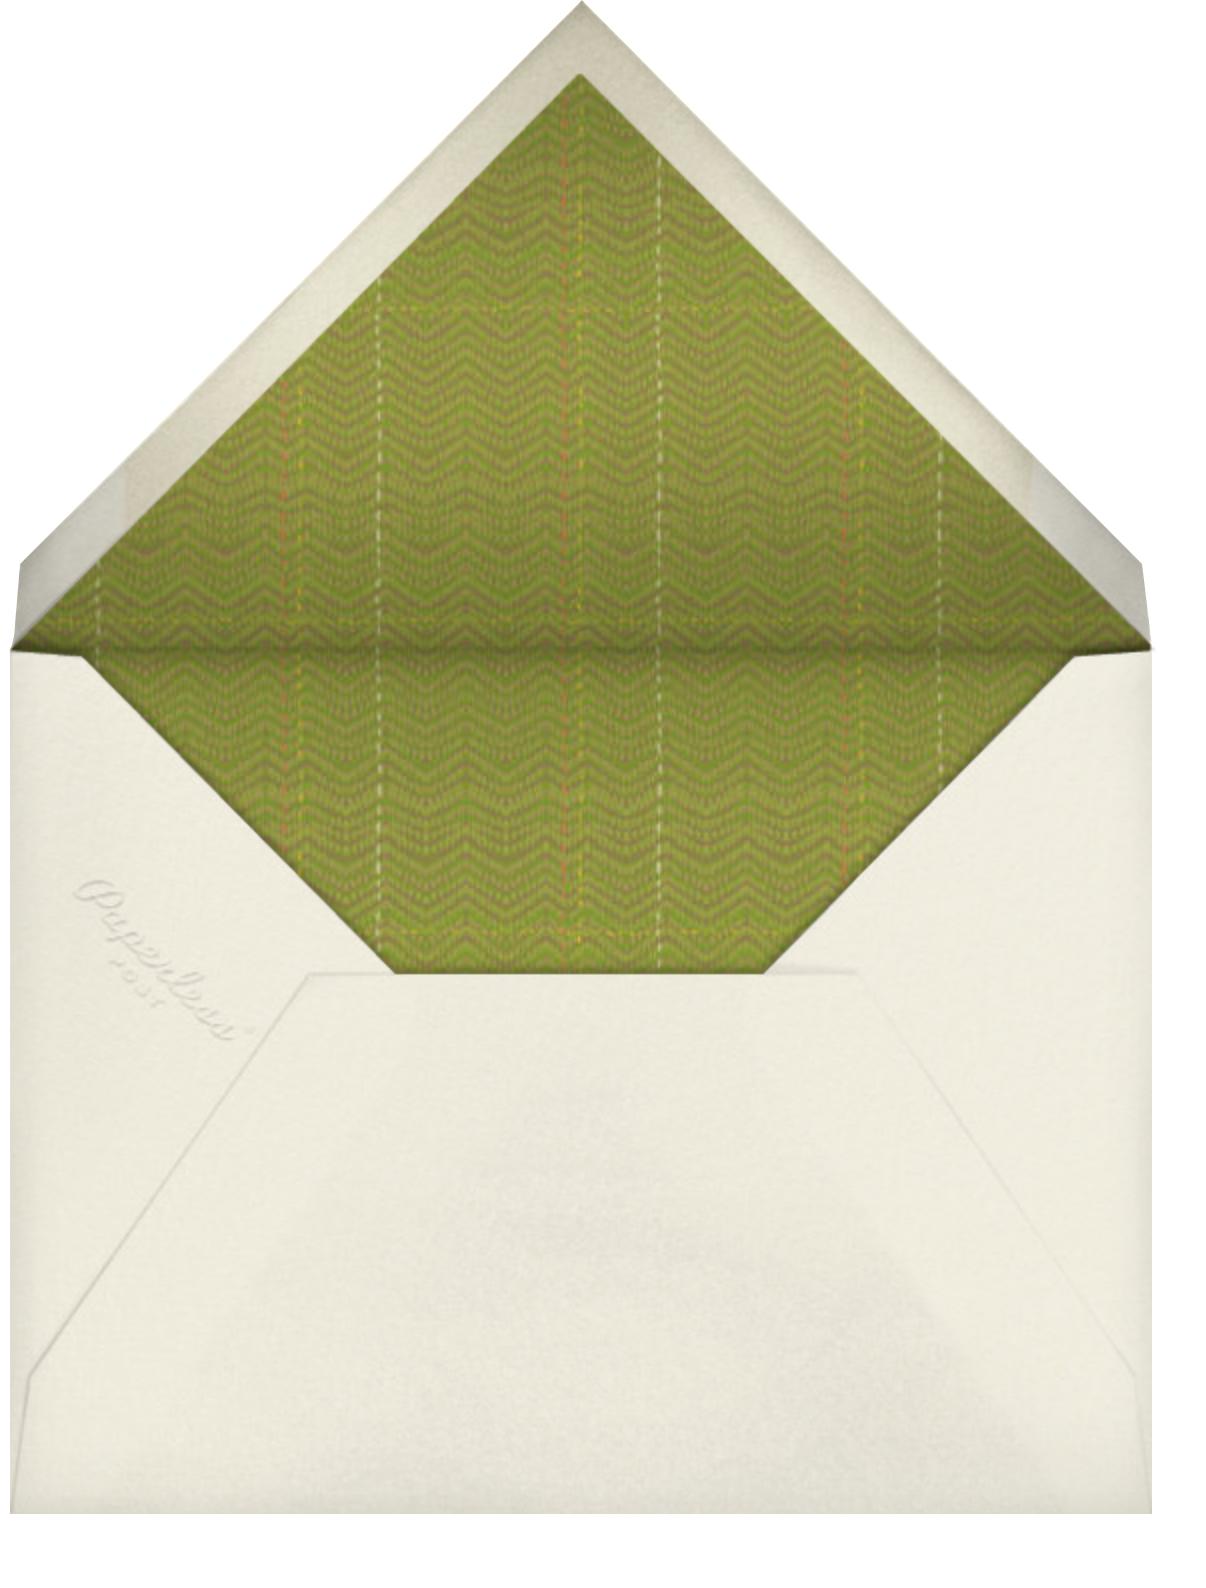 Squashed - Paperless Post - Envelope